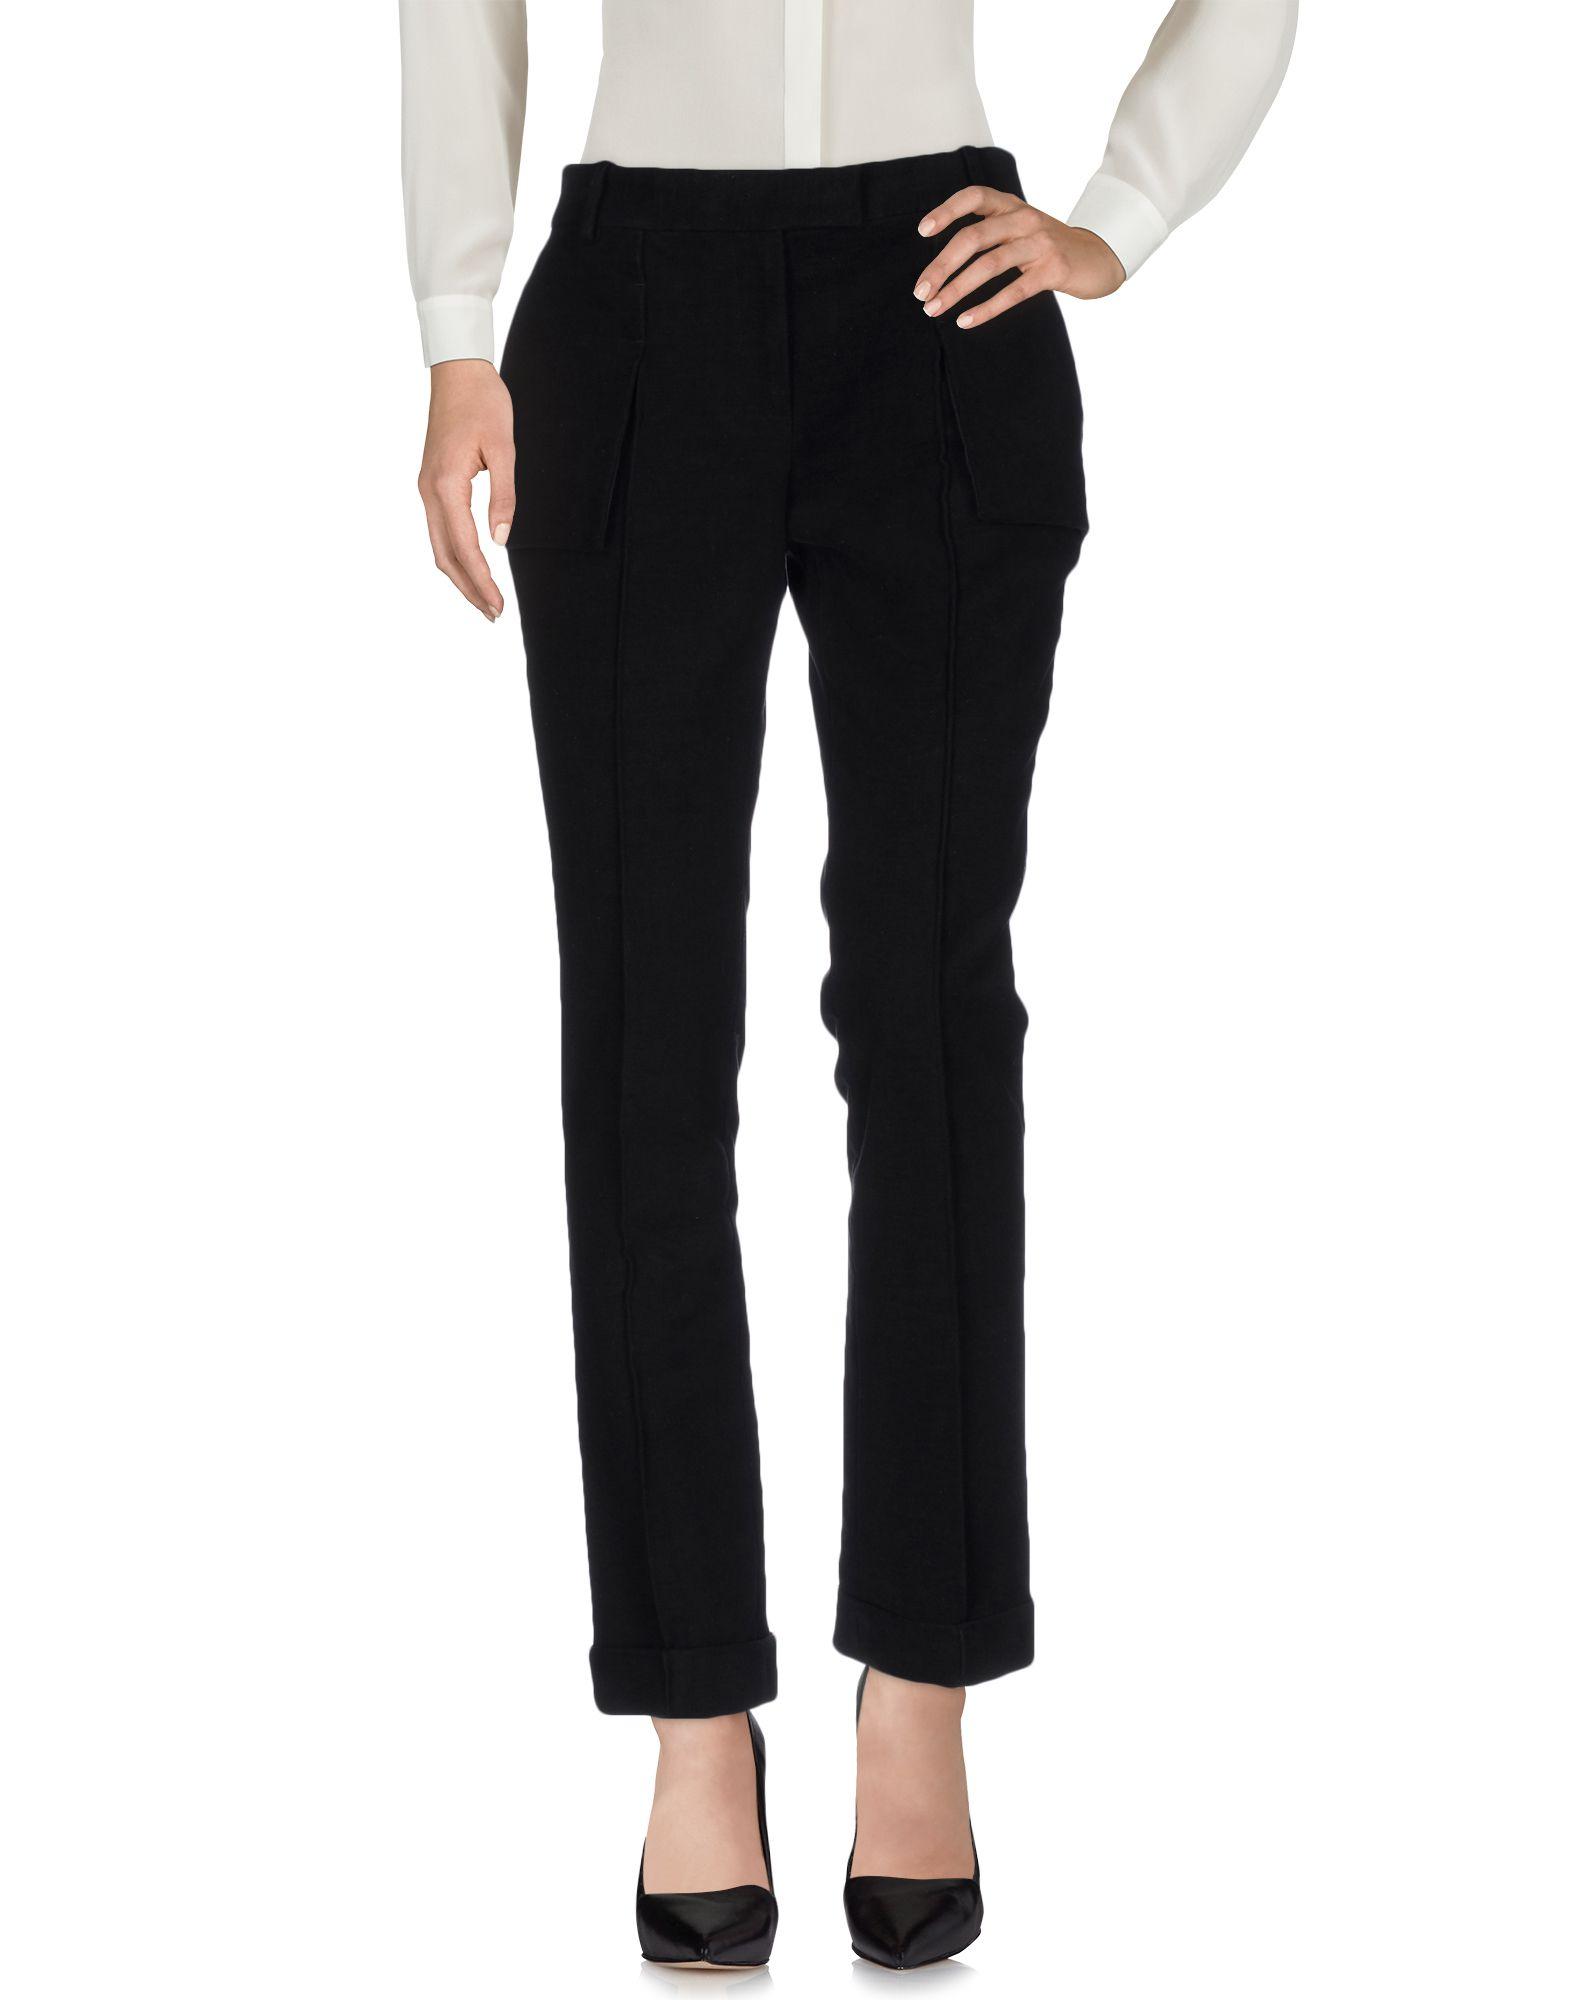 GIULIANO FUJIWARA Casual Pants in Black